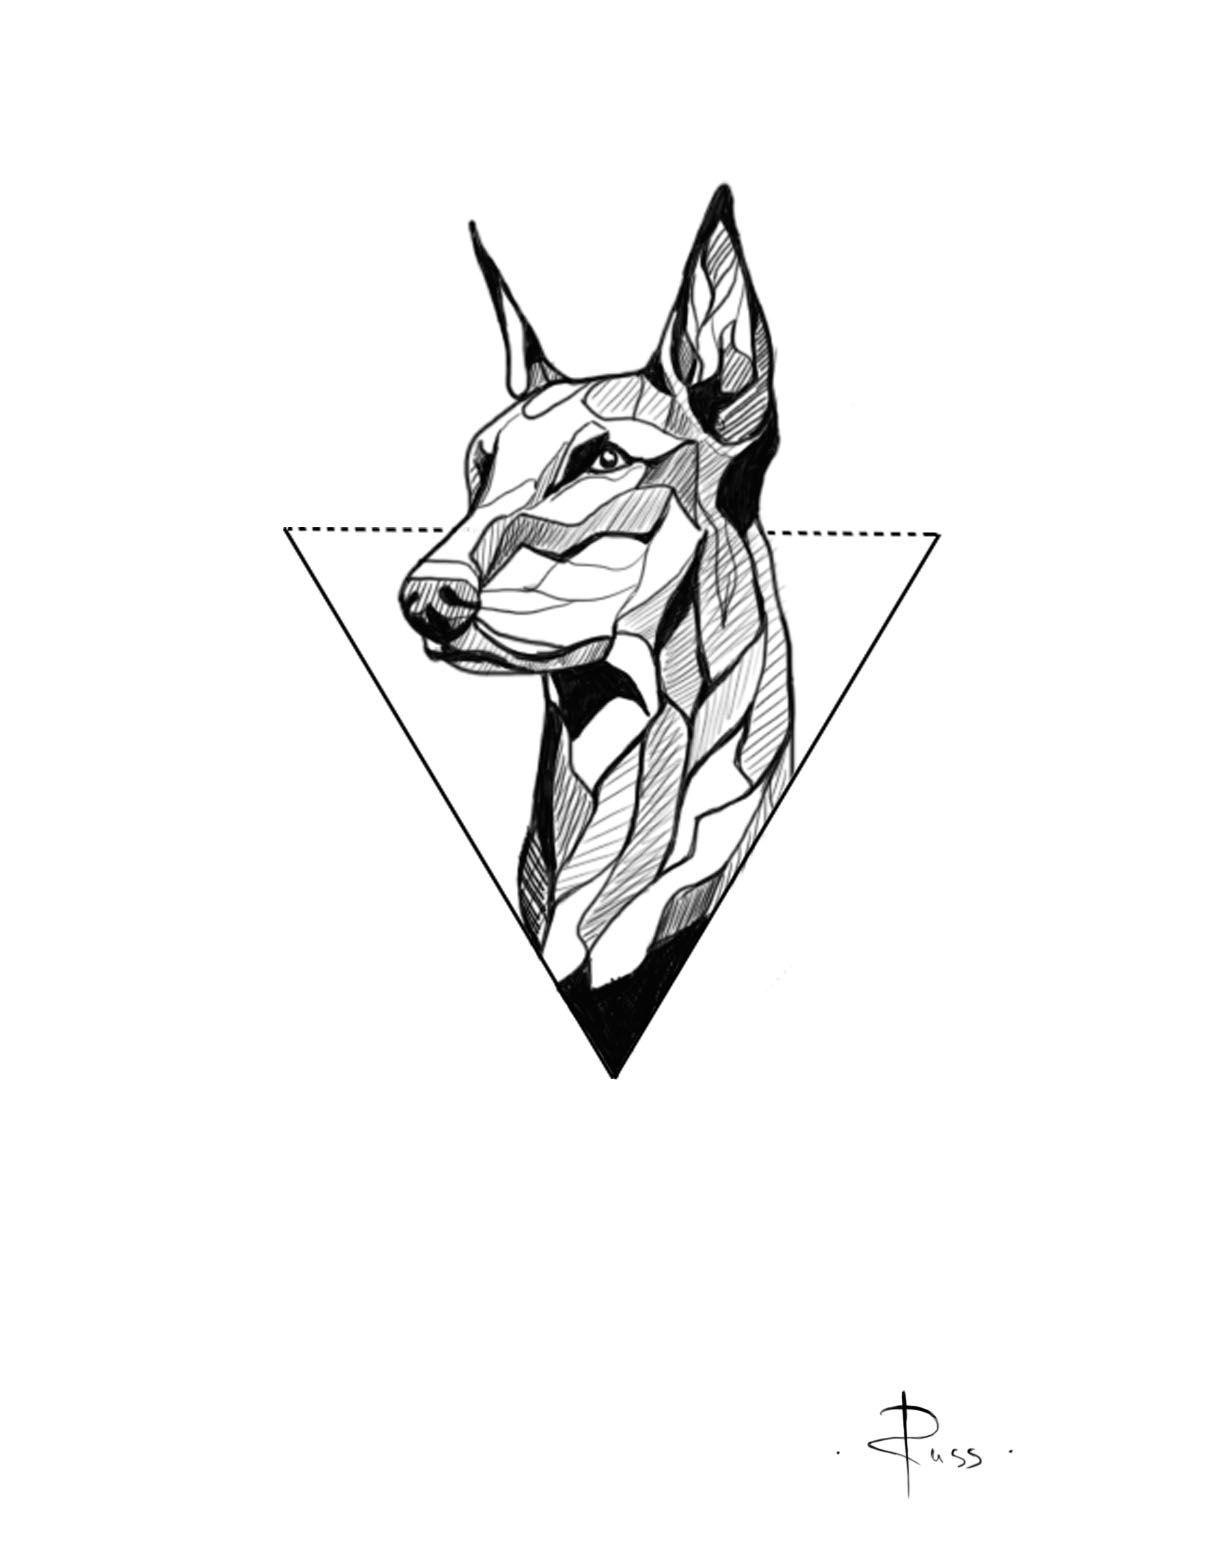 sketch fo tattoo by RUSS --- linework --- dog -  sketch fo tattoo by RUSS — linework — dog The Effective Pictures We Offer You About finger tatt - #compasstattoo #cooltattoo #Dog #dogtattoo #linework #RUSS #Sketch #tattoo #tattooideen #treetattoo